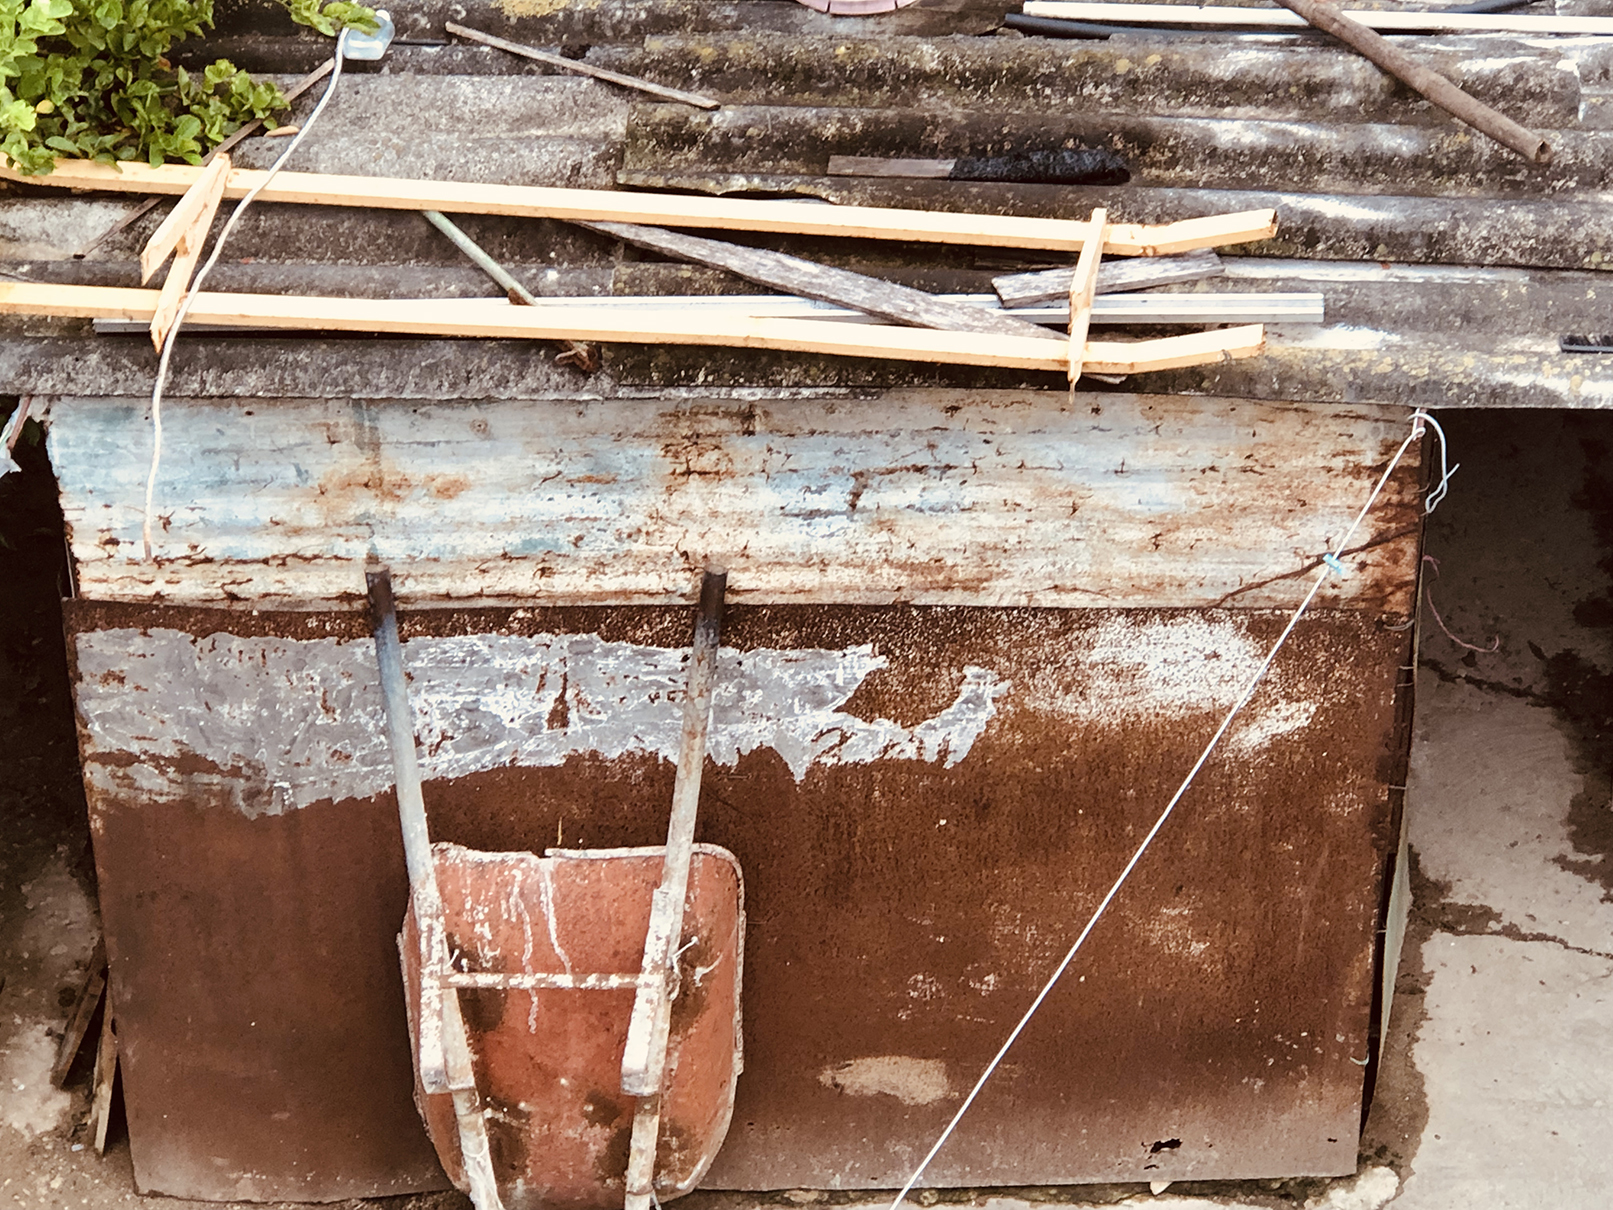 Havana Dumpster